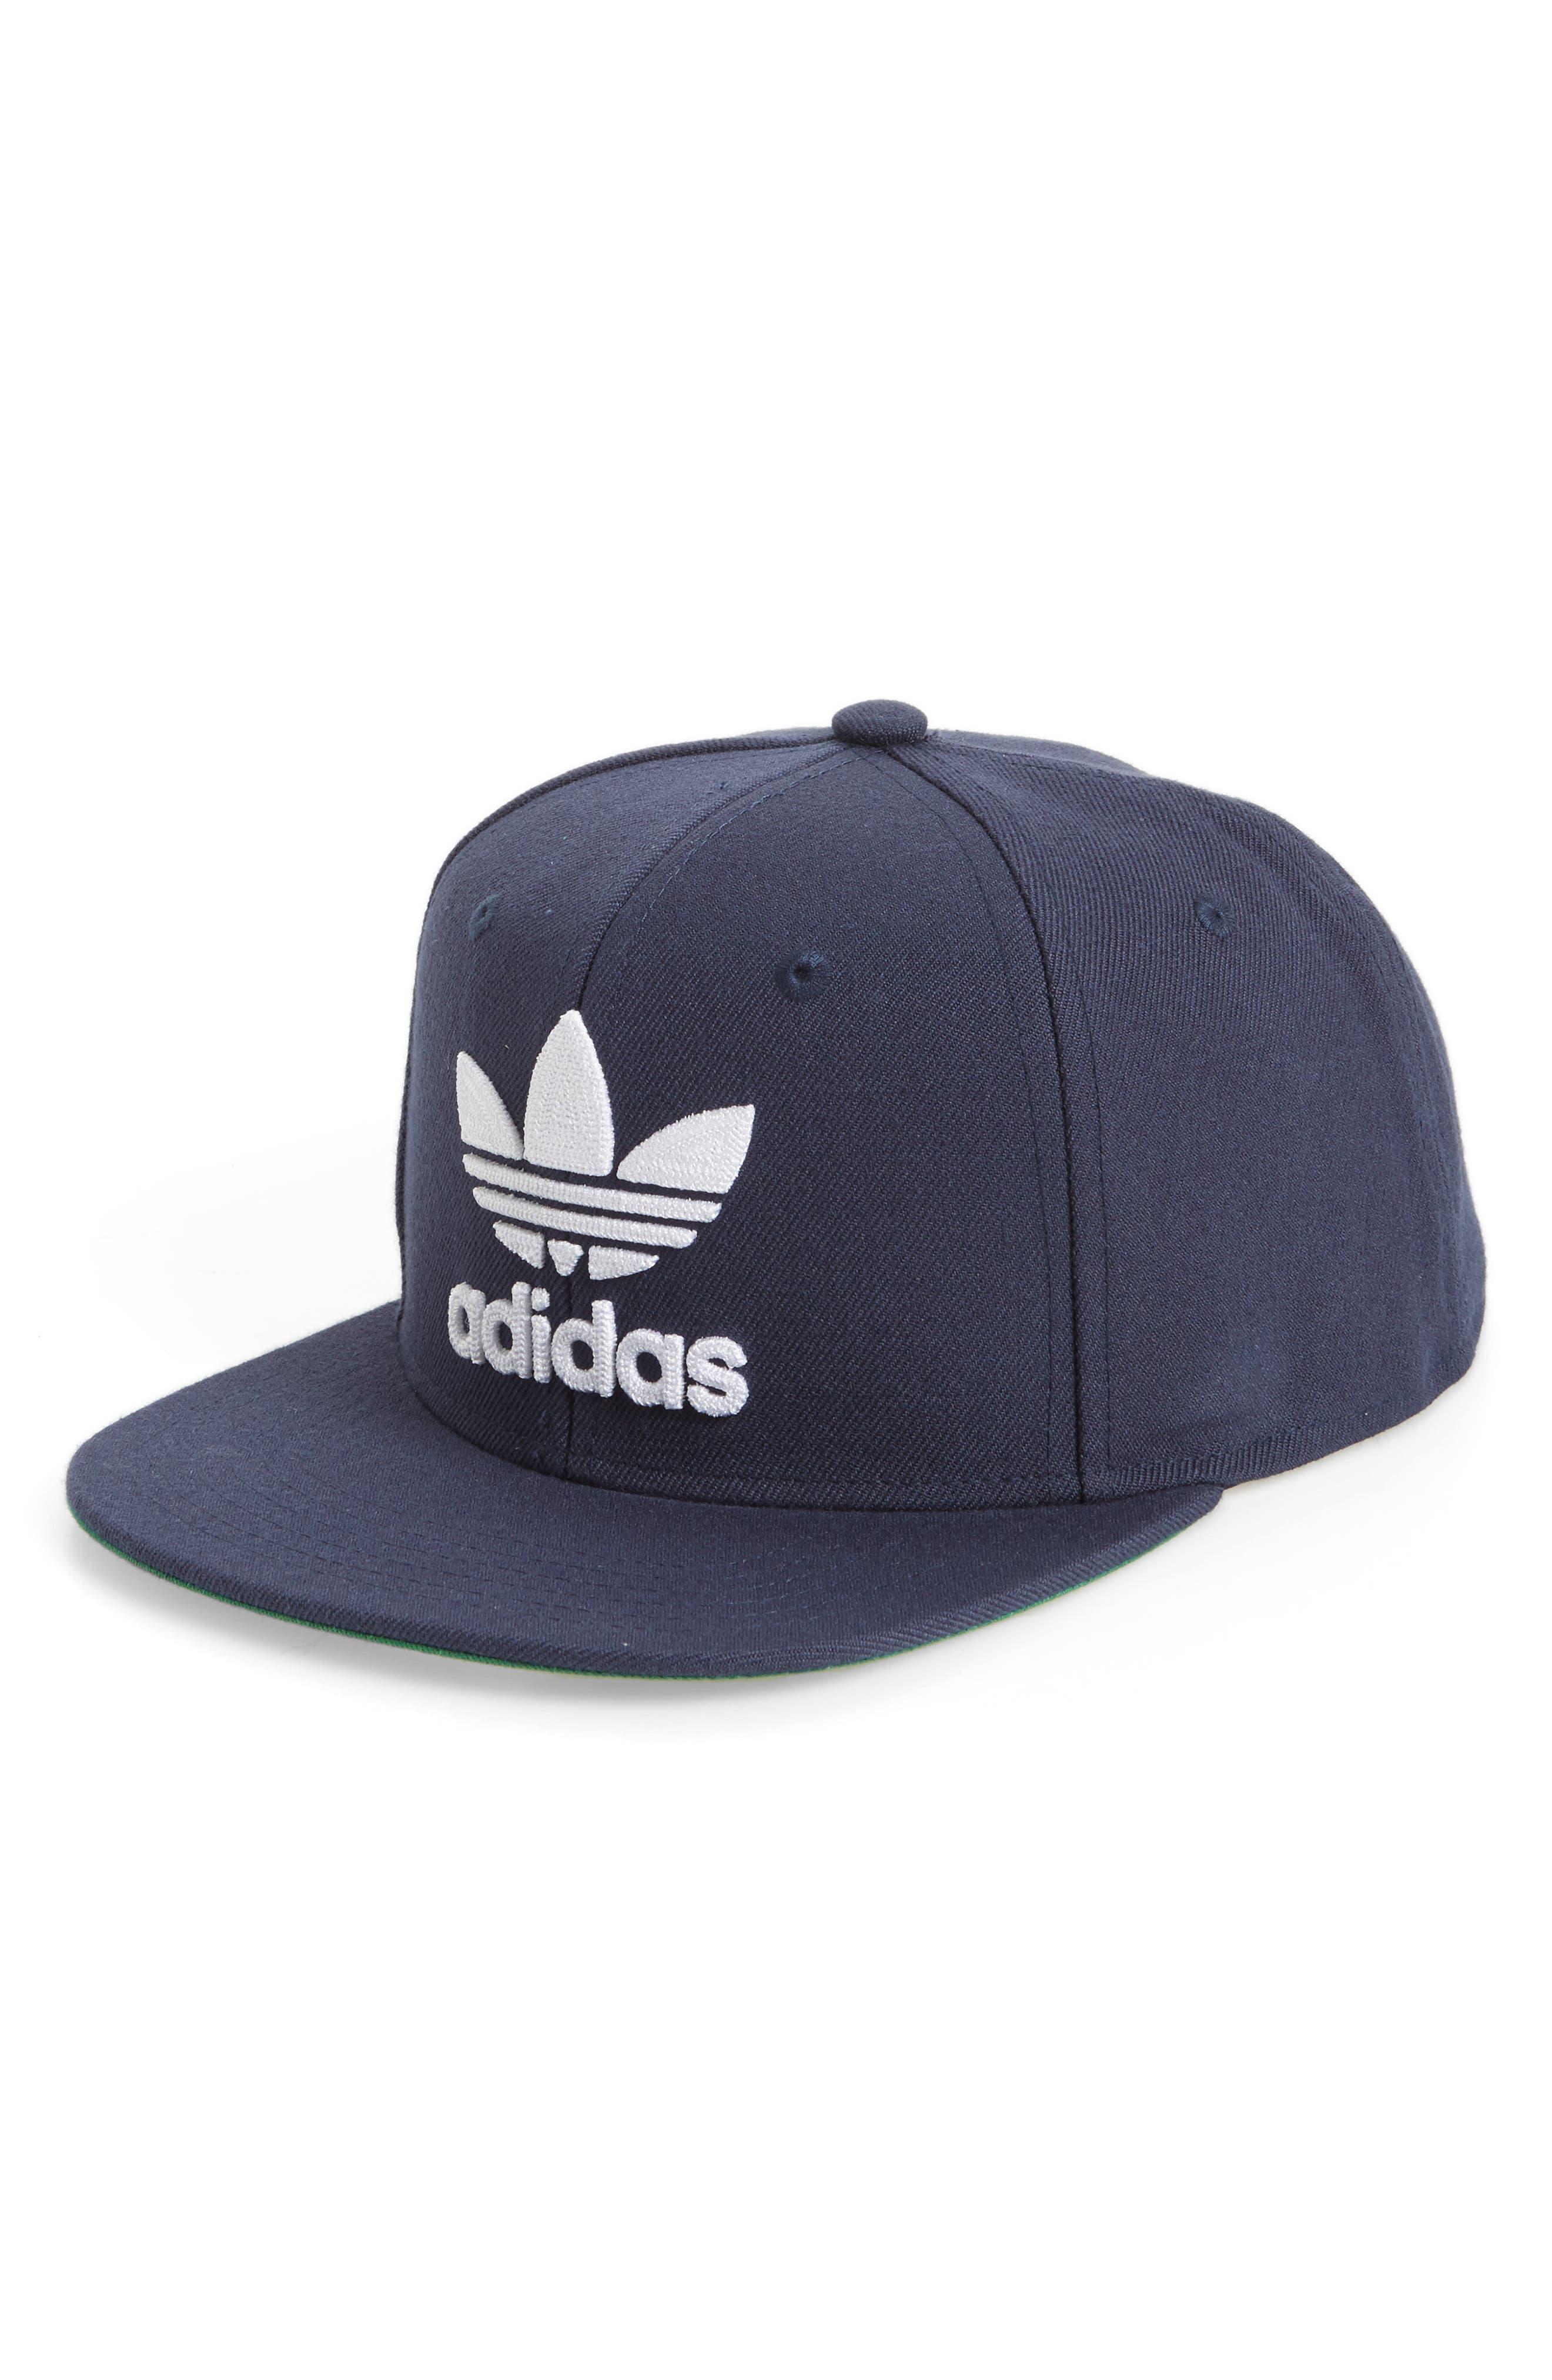 ADIDAS ORIGINALS adidas Trefoil Chain Snapback Baseball Cap